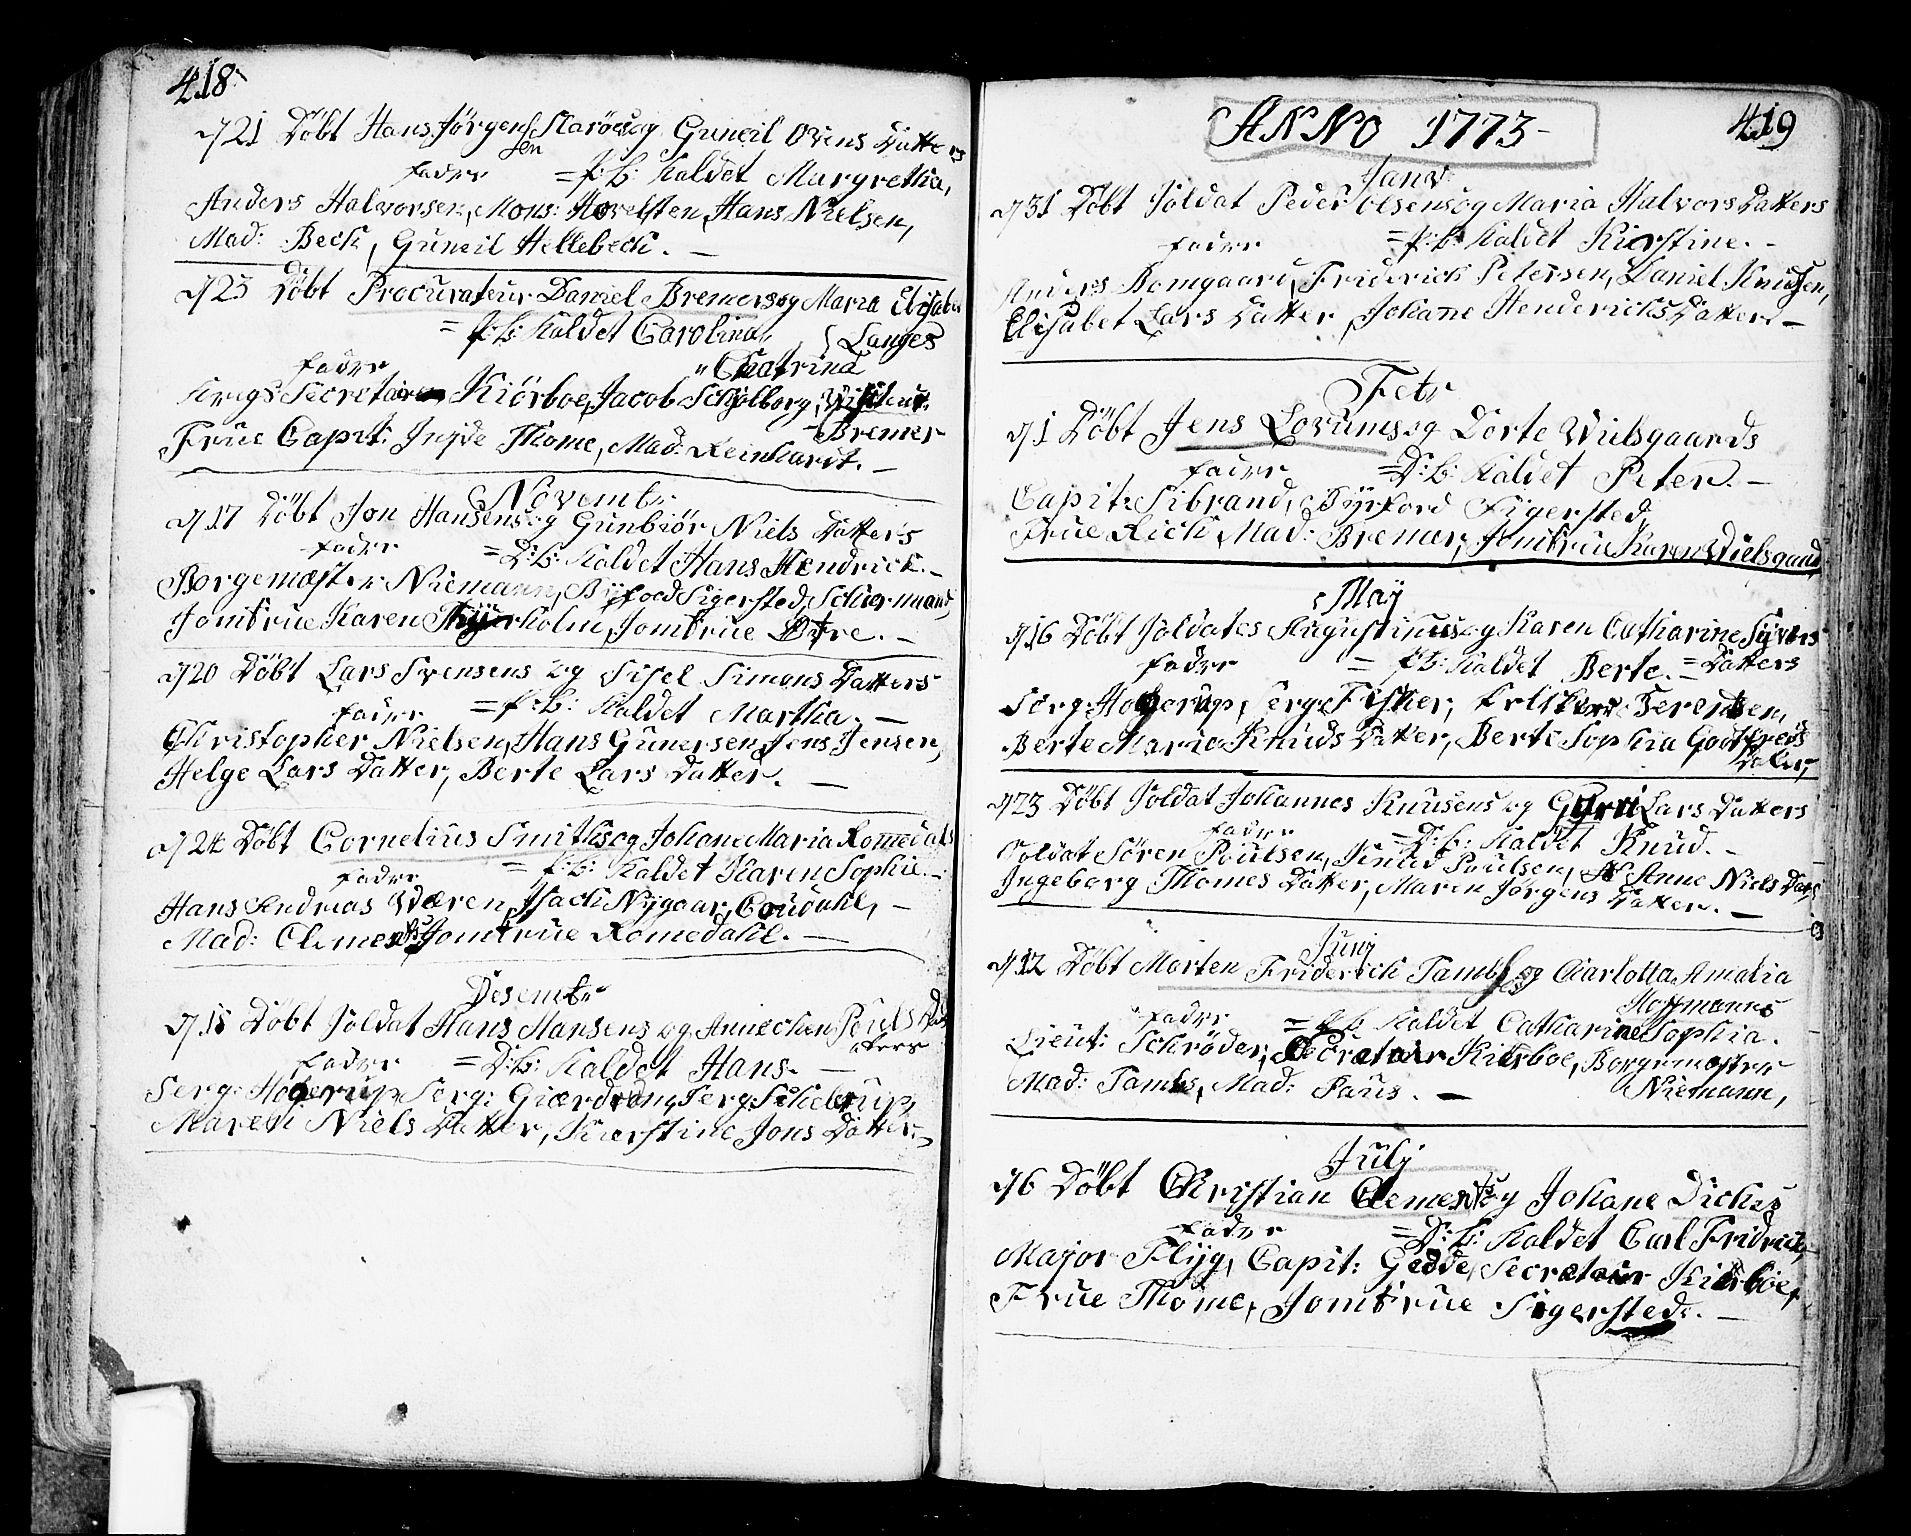 SAO, Fredrikstad prestekontor Kirkebøker, F/Fa/L0002: Ministerialbok nr. 2, 1750-1804, s. 418-419